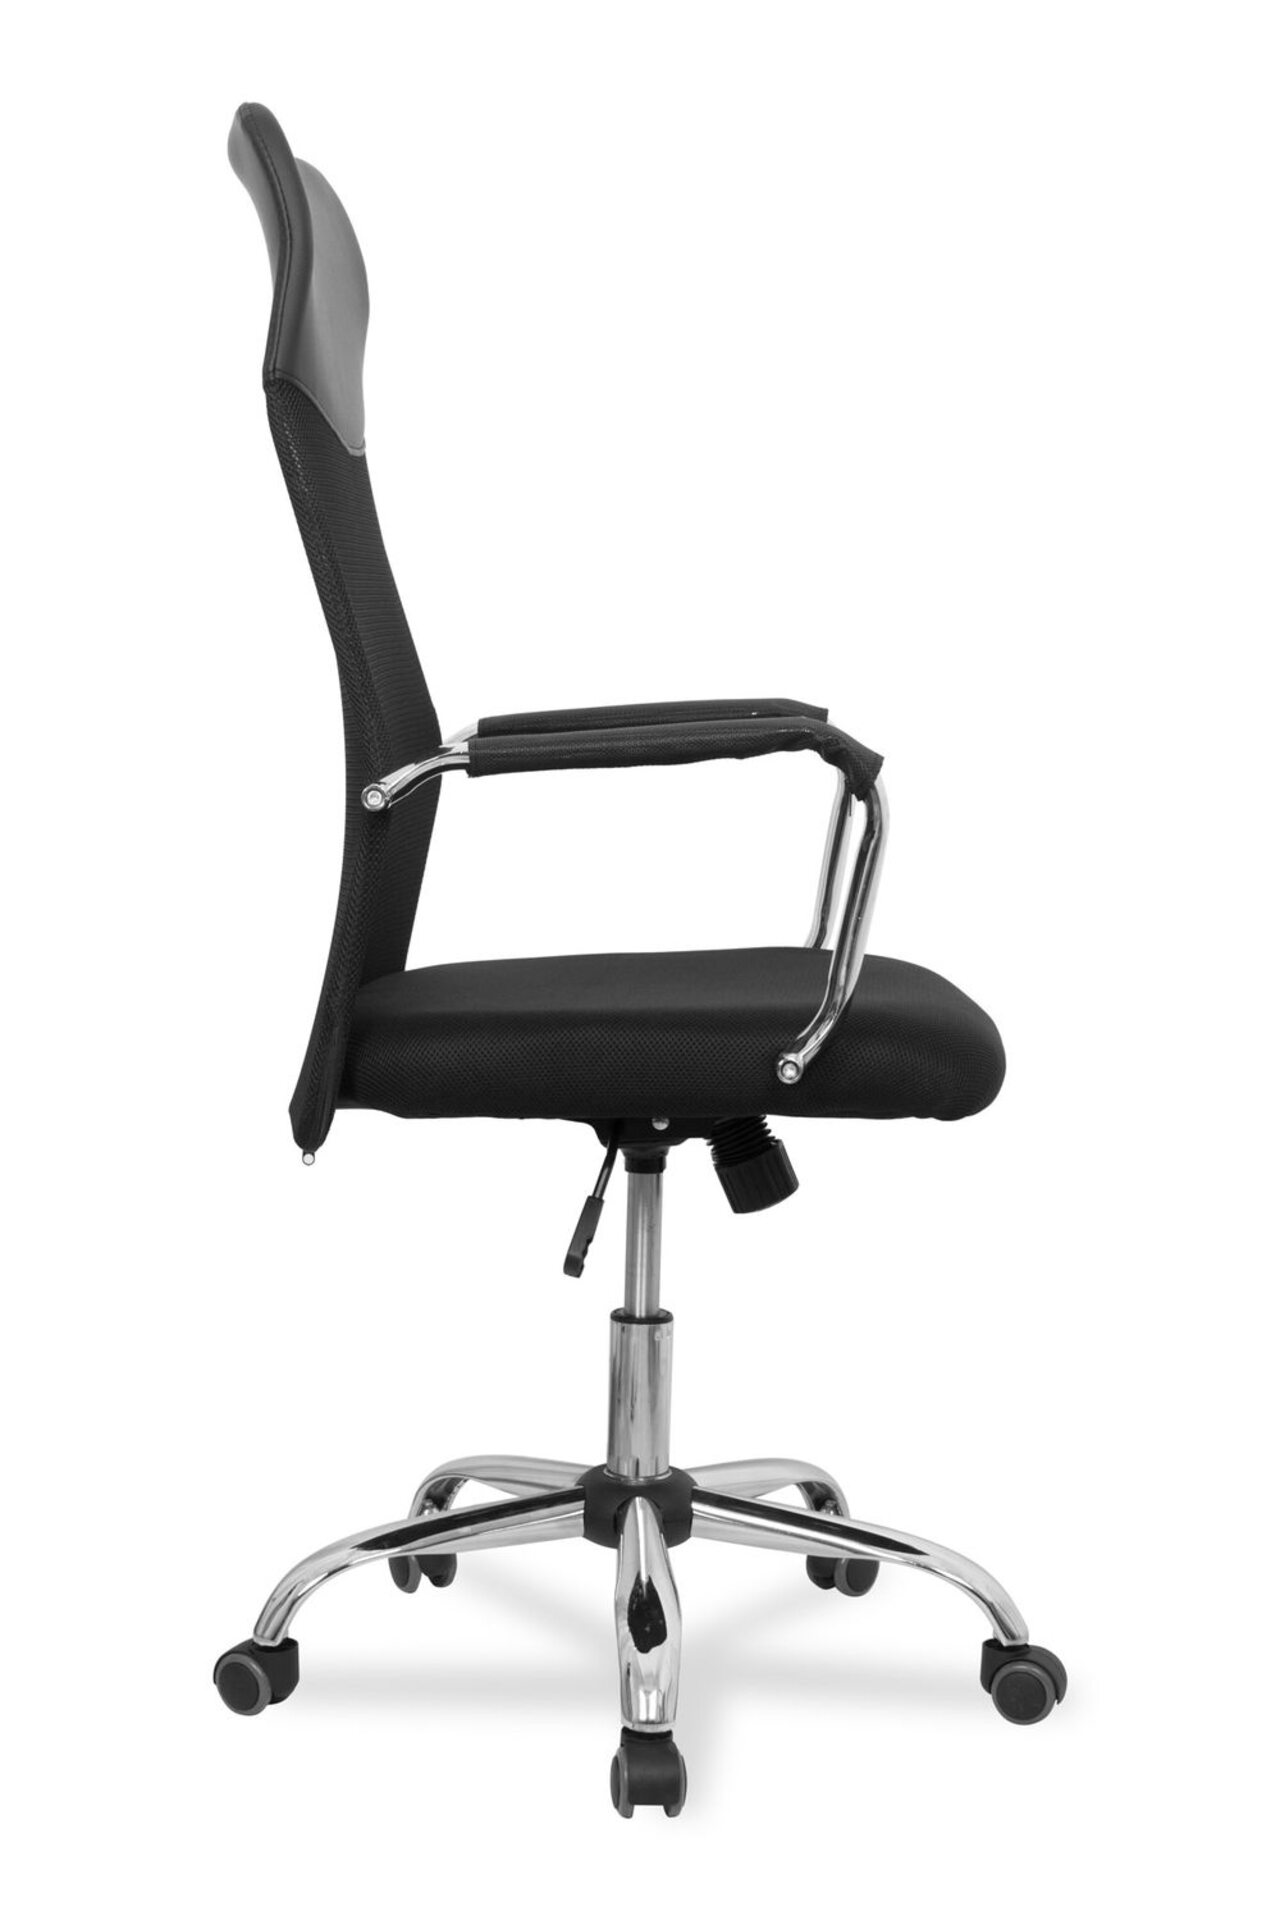 Кресло руководителя College CLG-419 MХН - фото 5